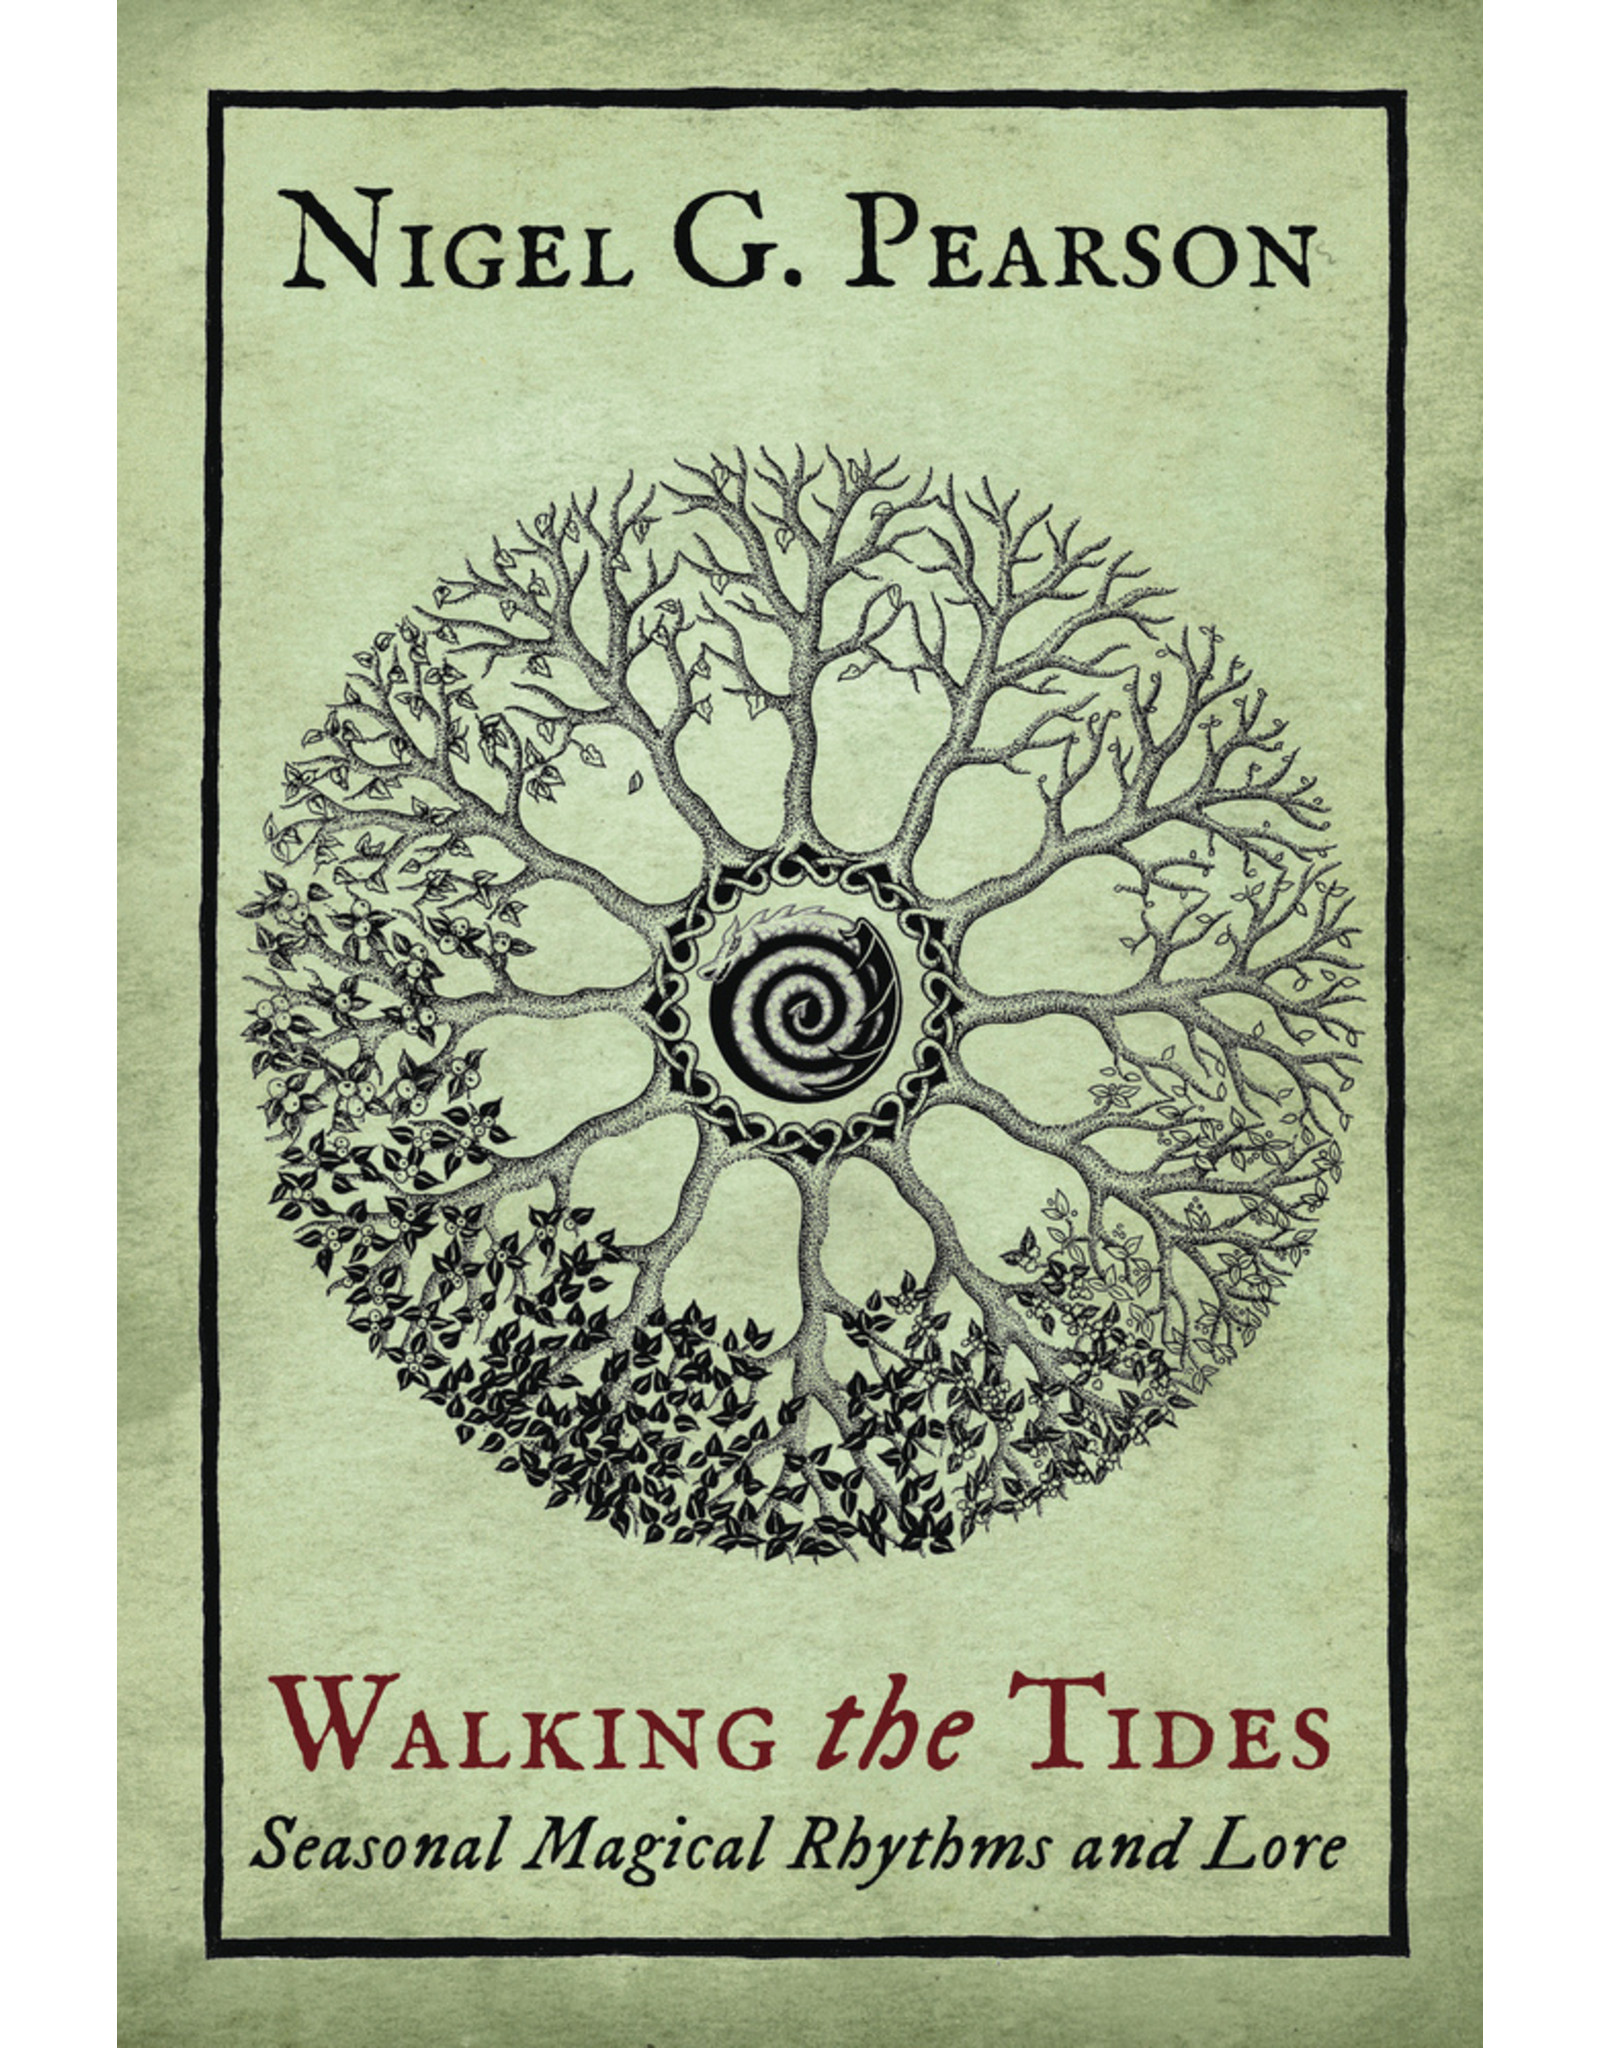 Walking the Tides: Seasonal Magical Rhythms and Lore